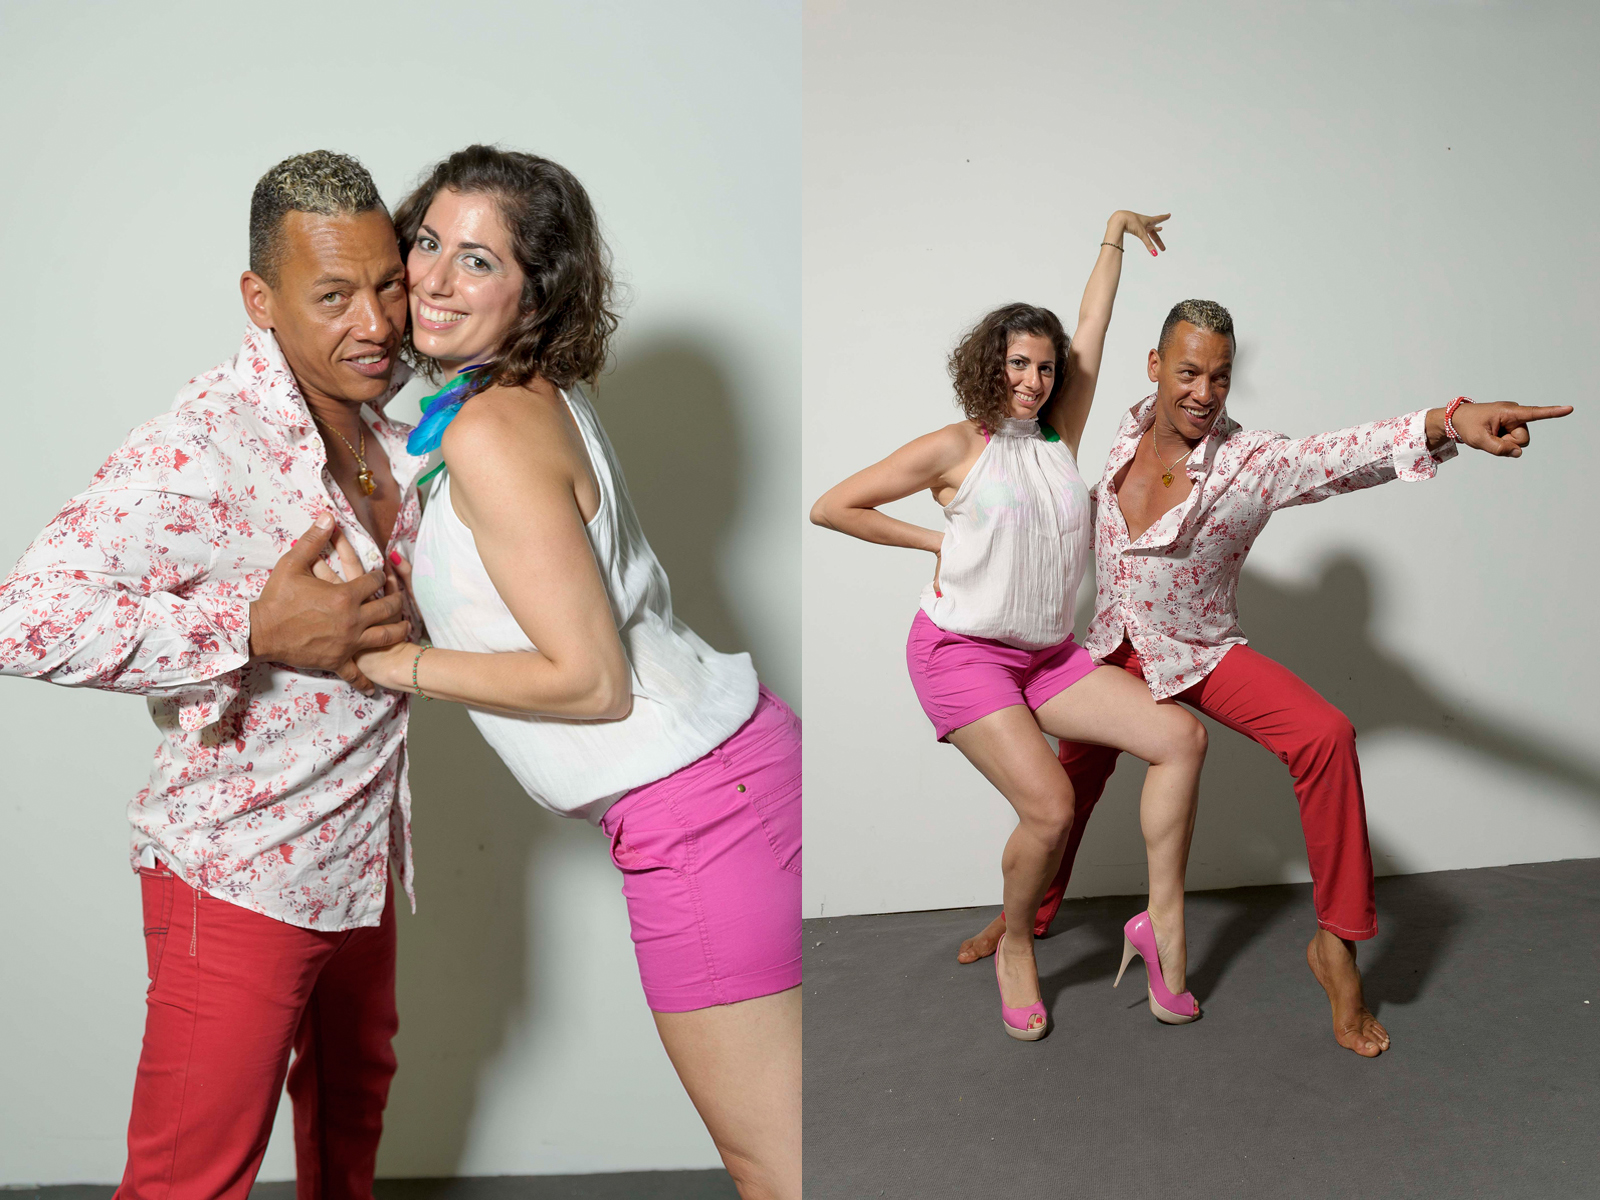 Anais H Extremo Fotos 9th croatian summer salsa festival, rovinj 2013